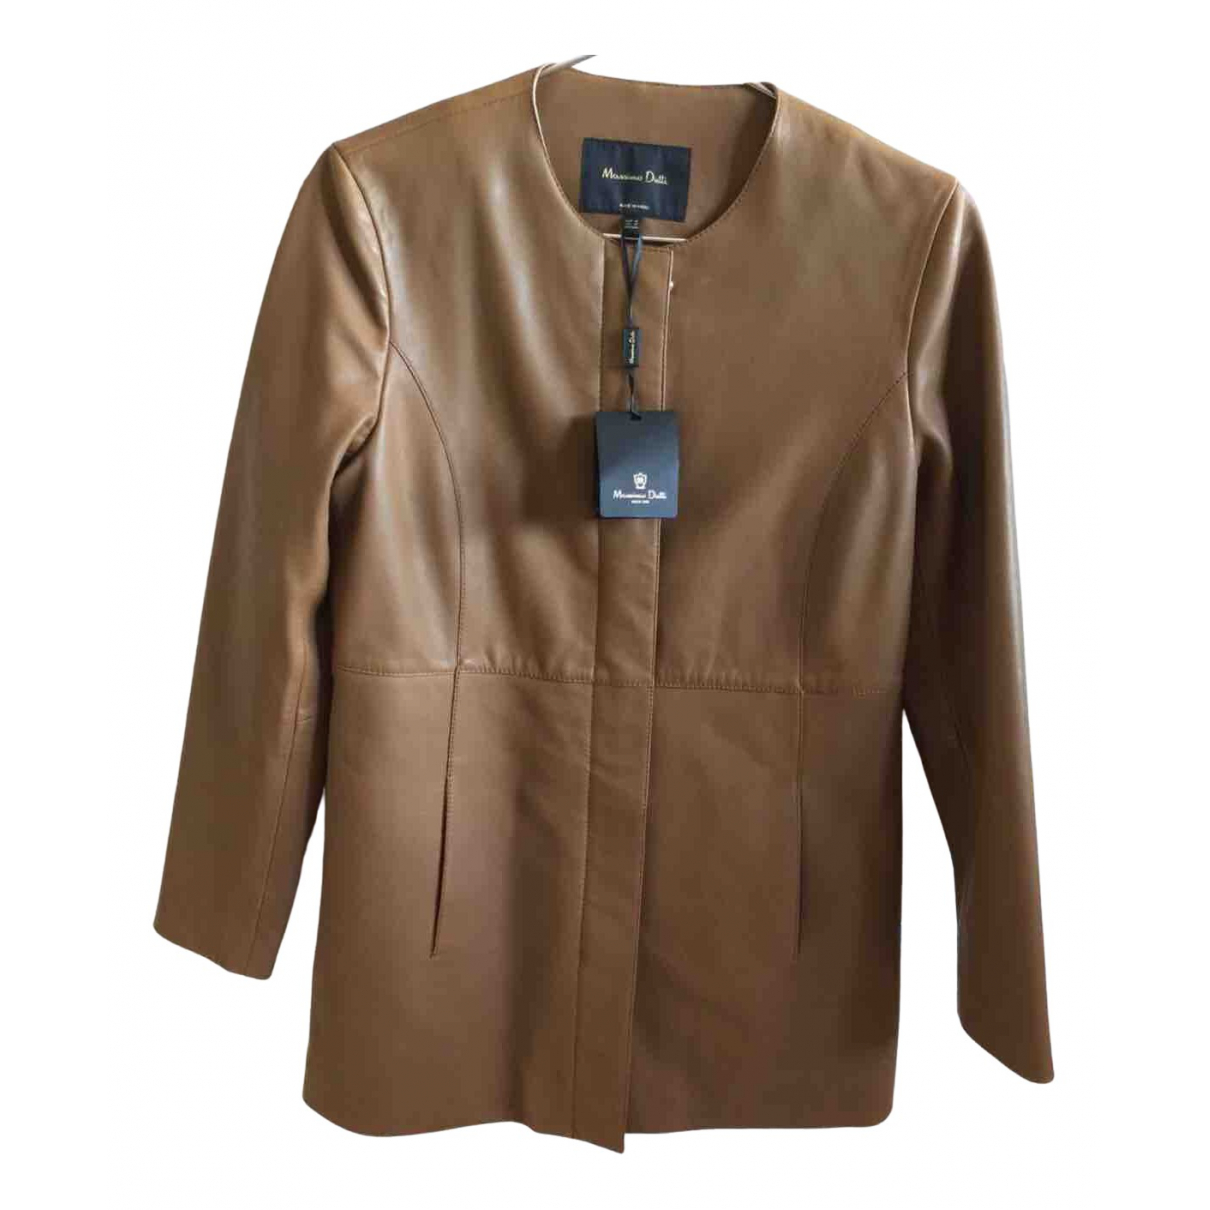 Massimo Dutti \N Camel Shearling jacket for Women S International